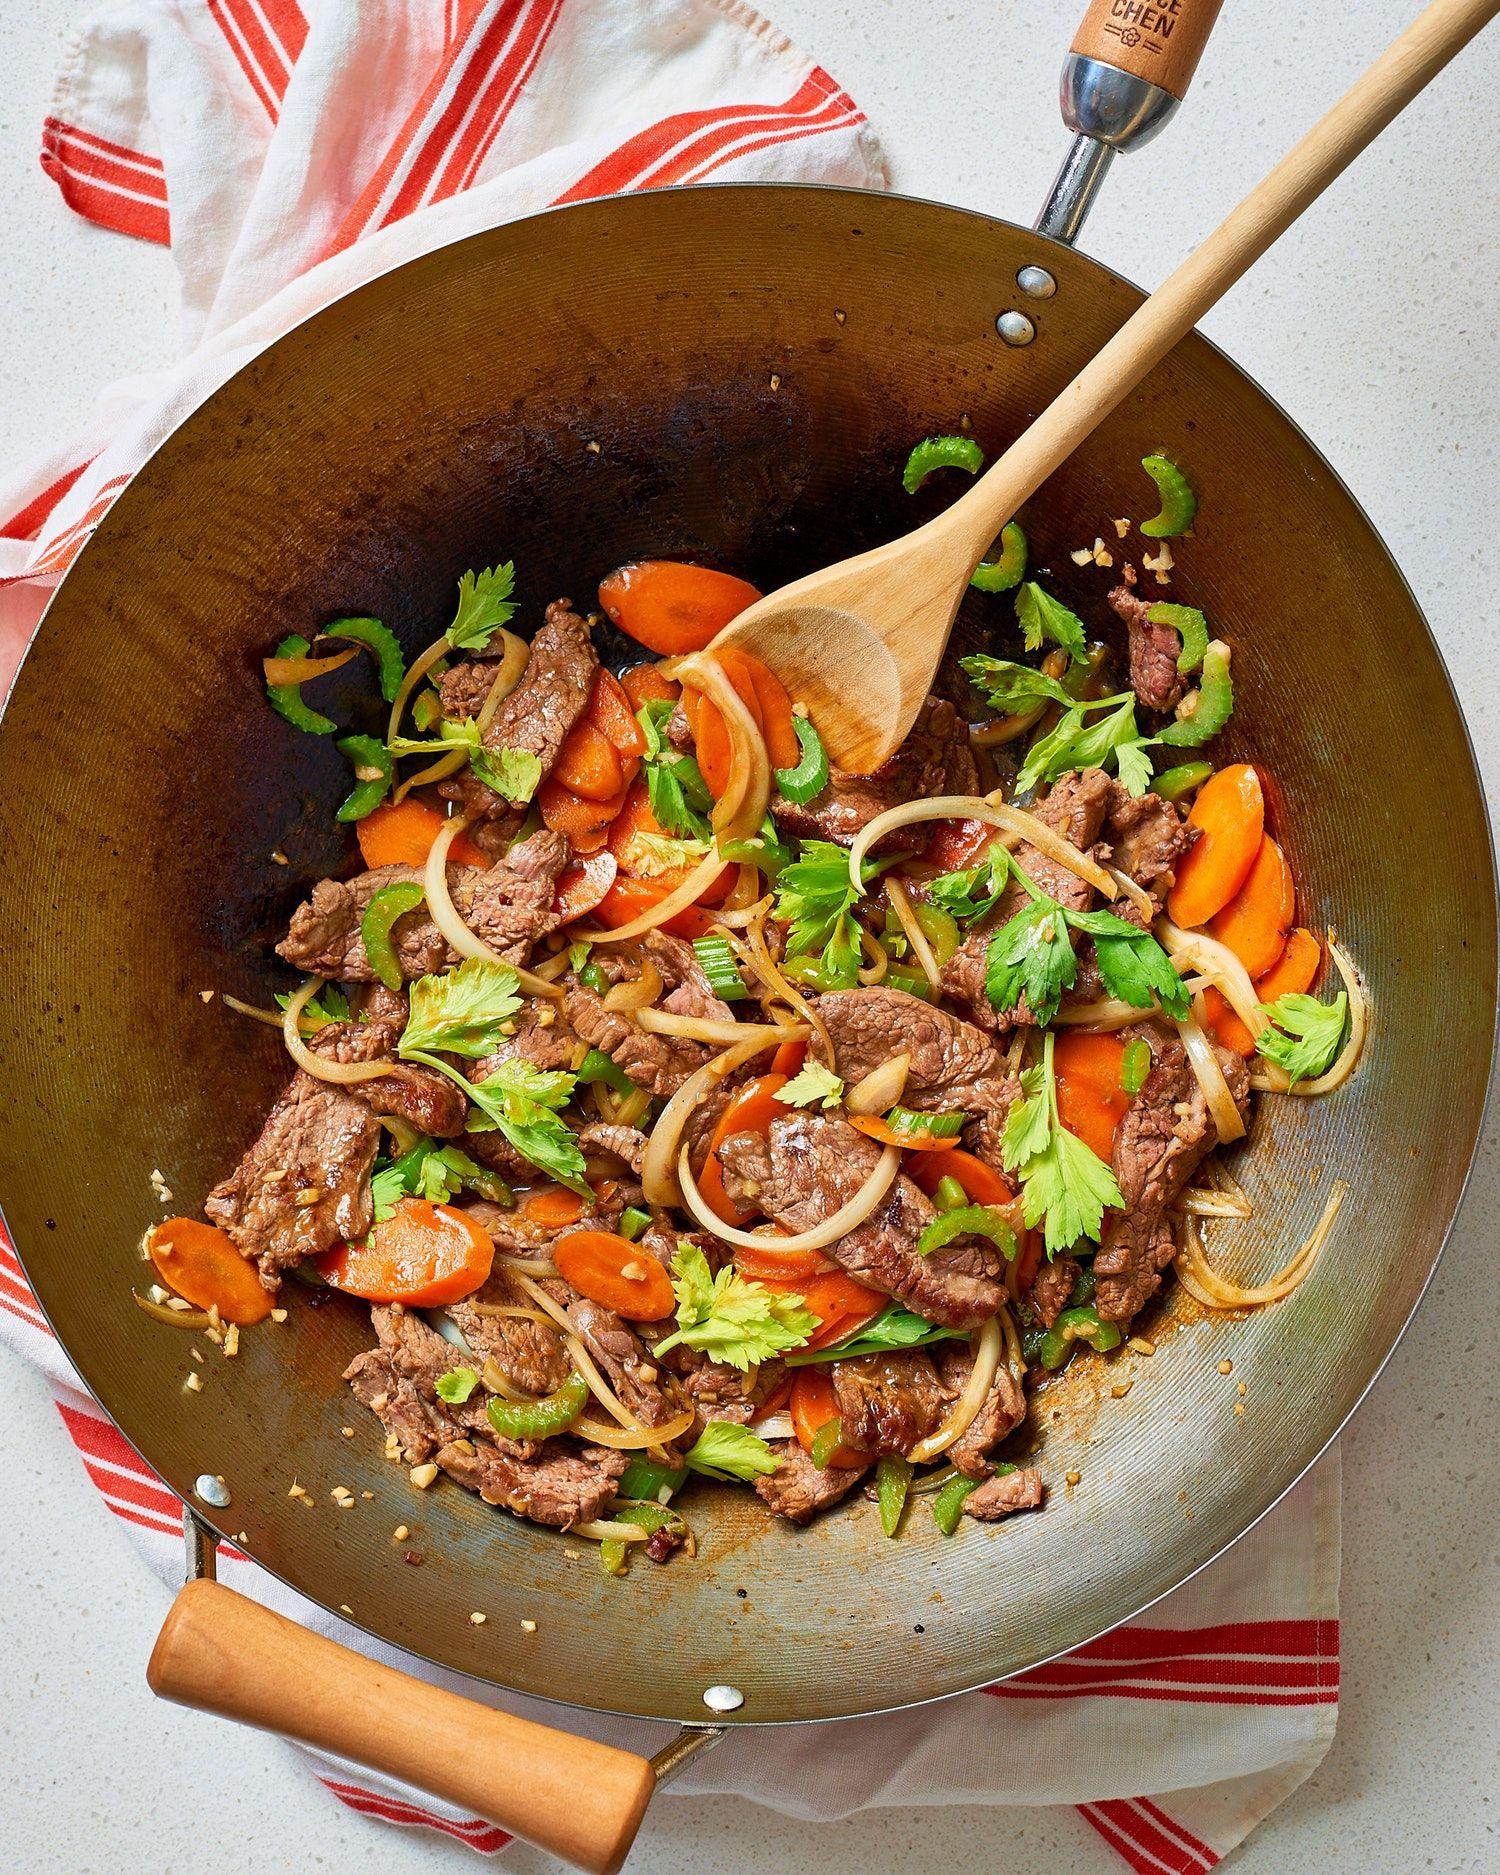 Beef and celery stirfry recipe stir fry frozen